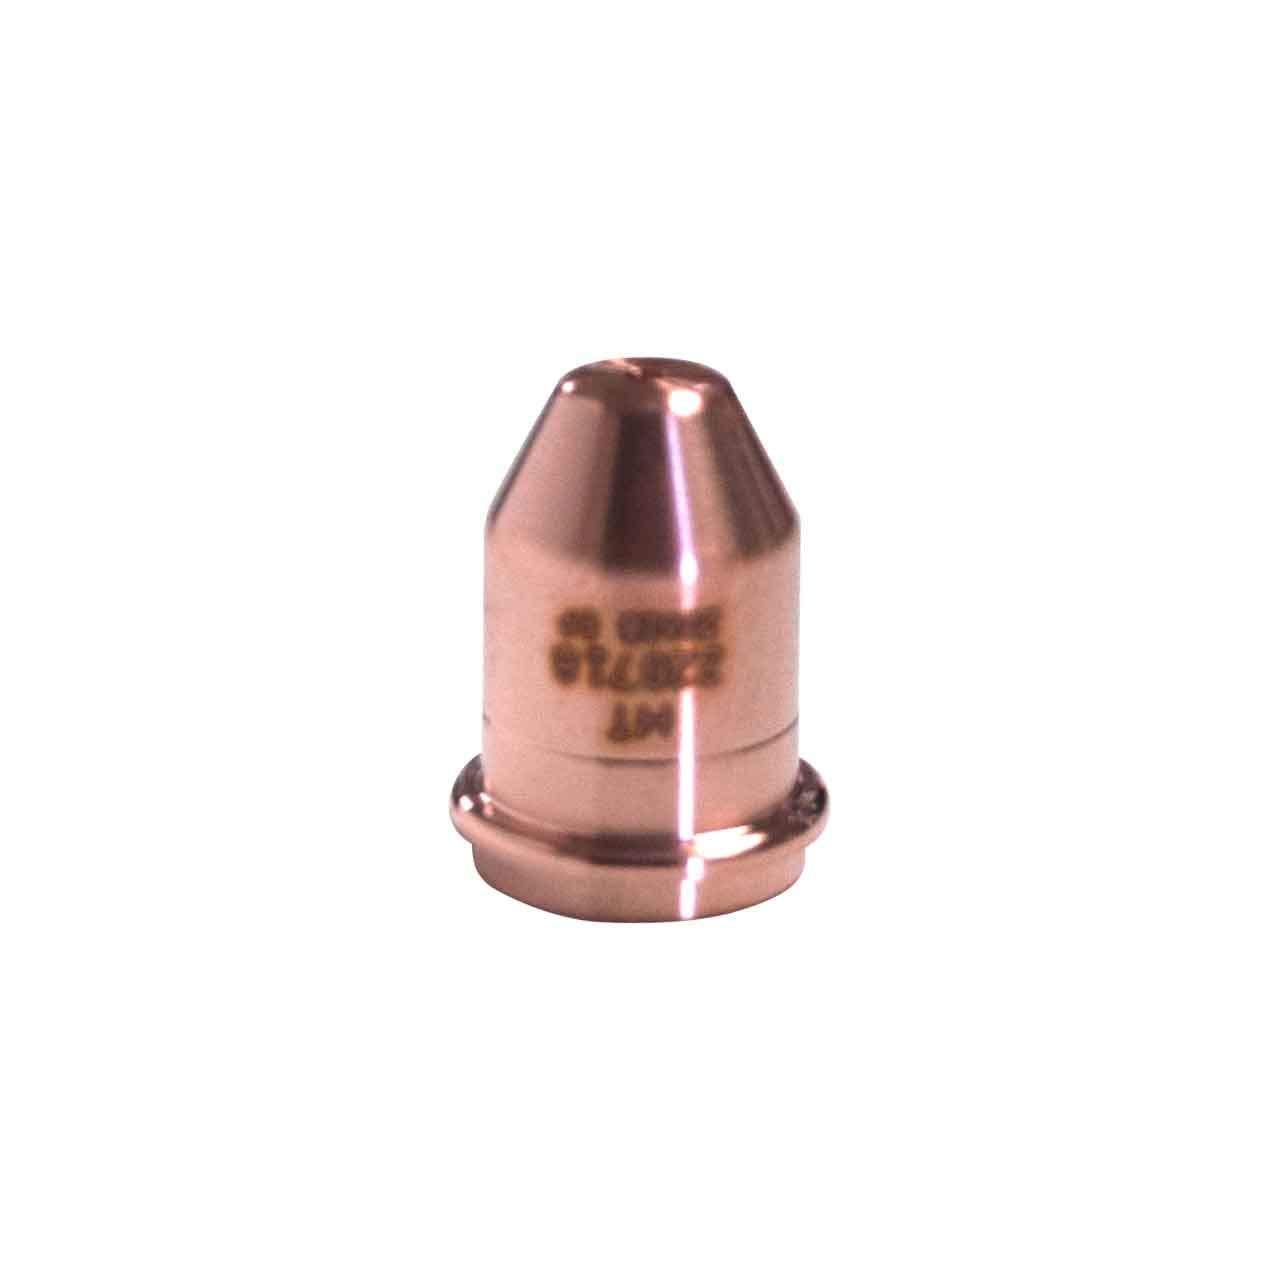 Hypertherm Powermax 45 Nozzle 220718 - 5 Pack